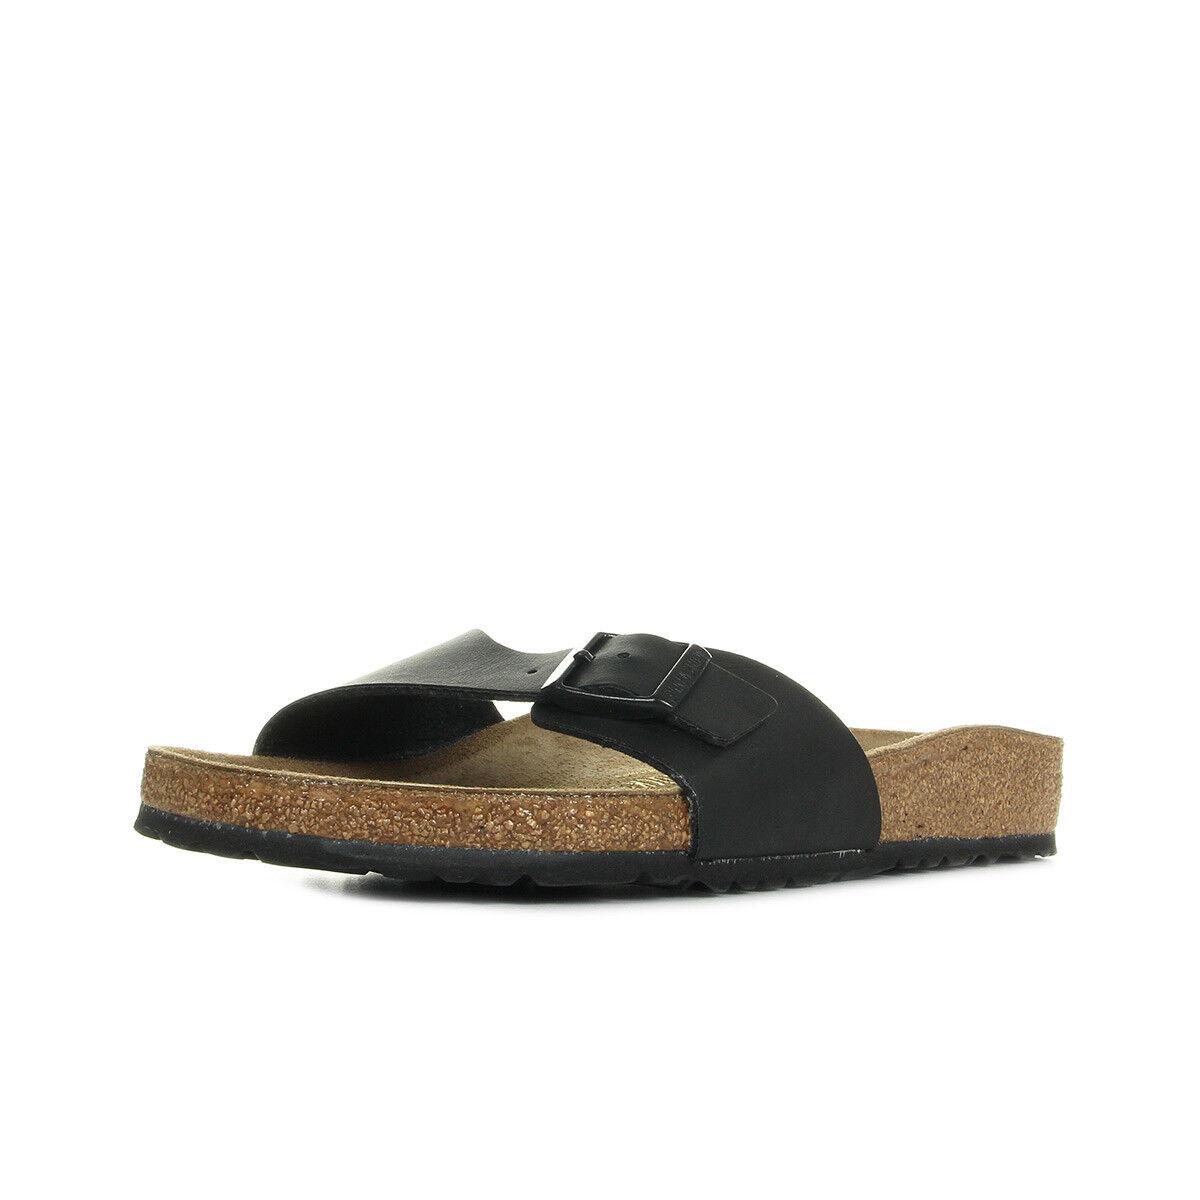 Billig Herren hohe Qualität Sandalen Birkenstock Herren Billig Madrid schwarz 2998a4